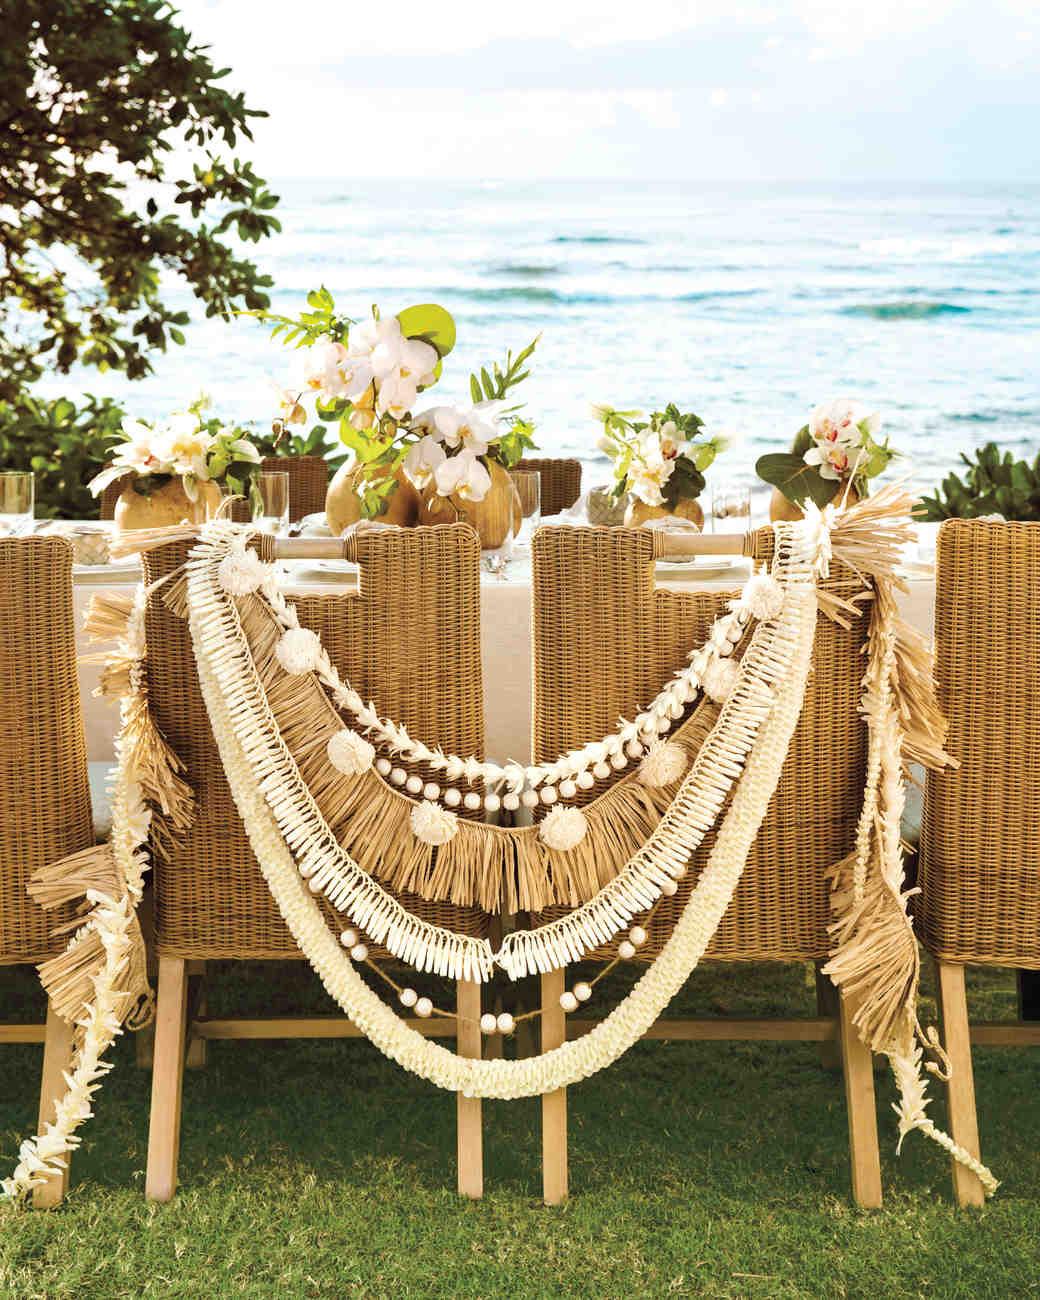 Hawaiian Wedding Reception Ideas: Island Time: 10 Ideas For Throwing A Tropical Wedding